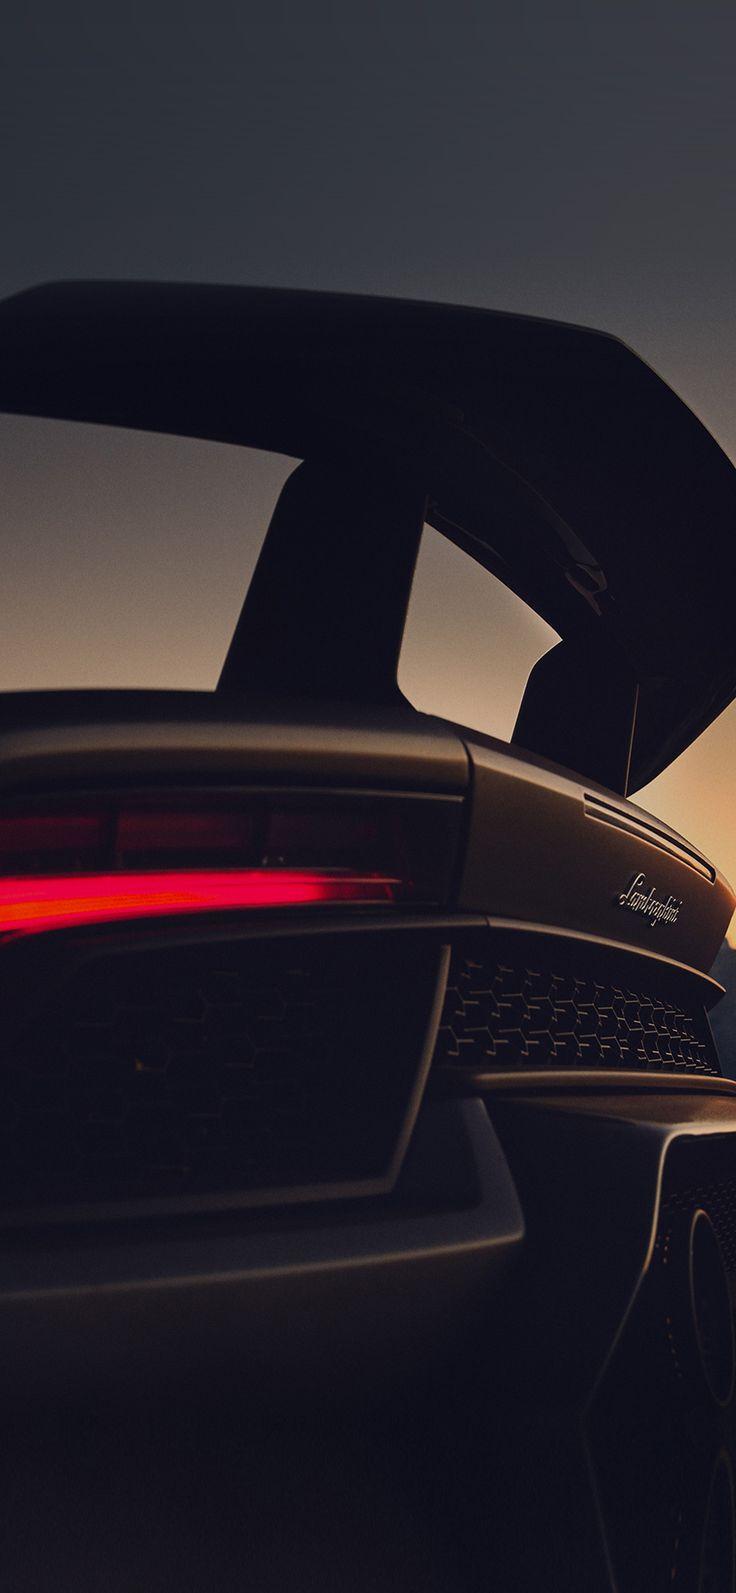 Iphone X Wallpaper Be51 Lamborghini Car Dark Art Illustration Via